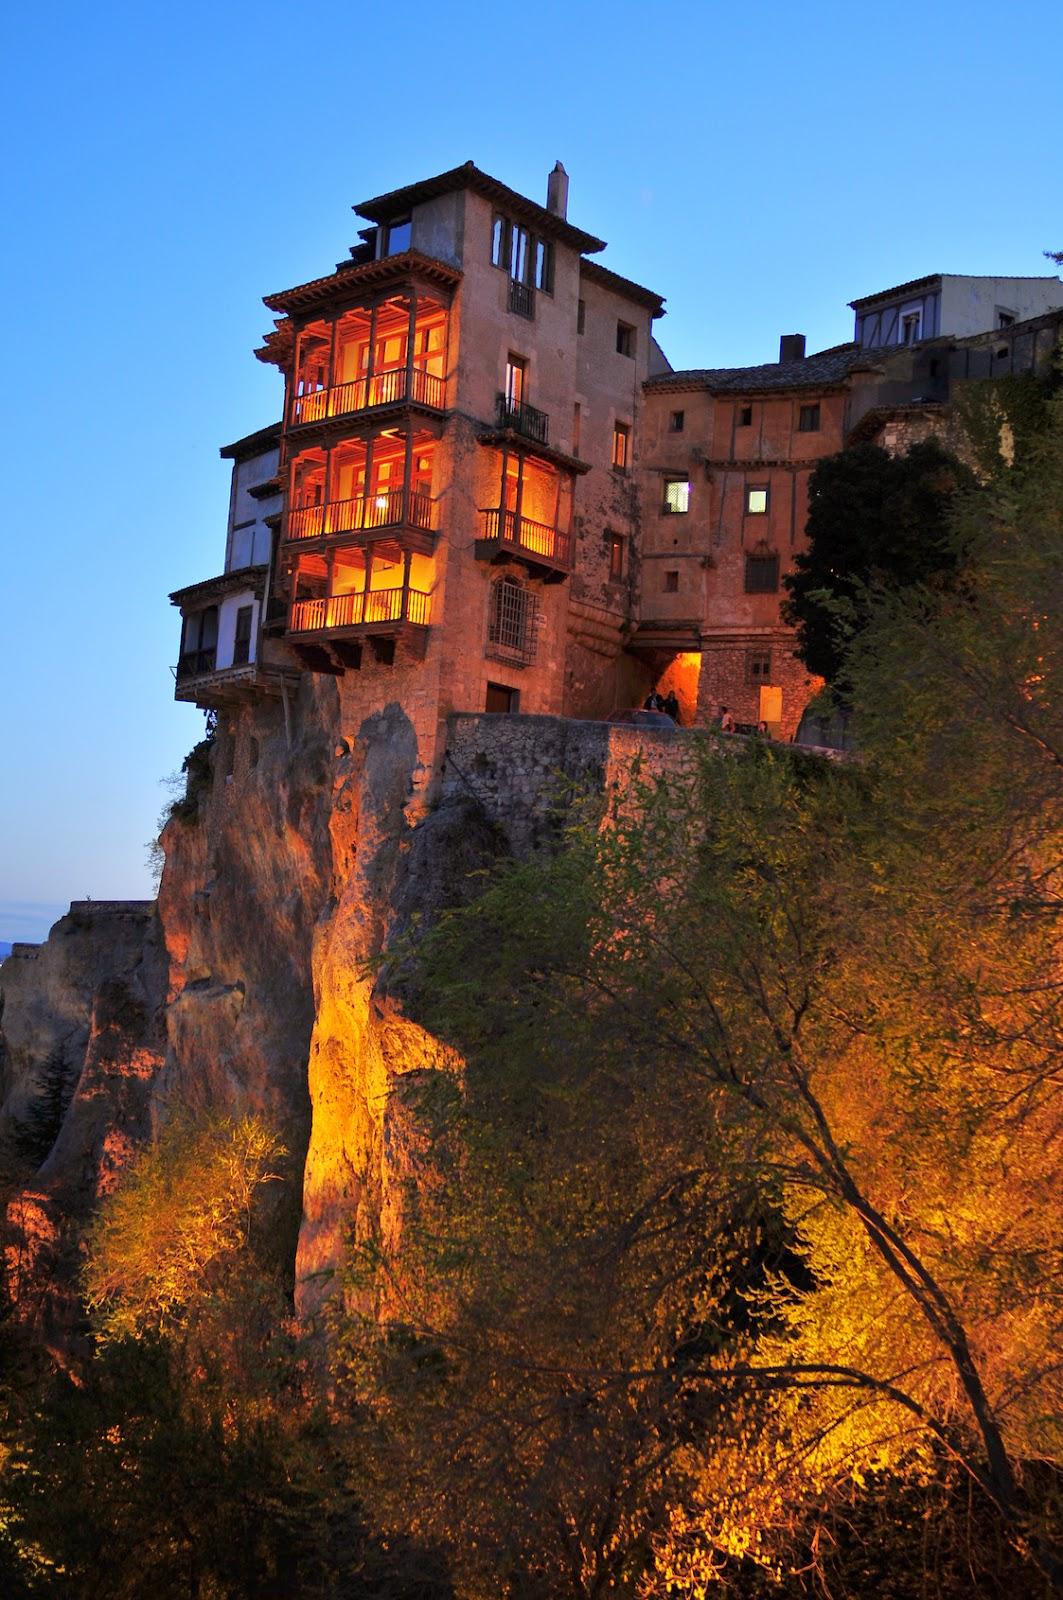 Cuenca, Tu Maleta, Noticias, Viajes